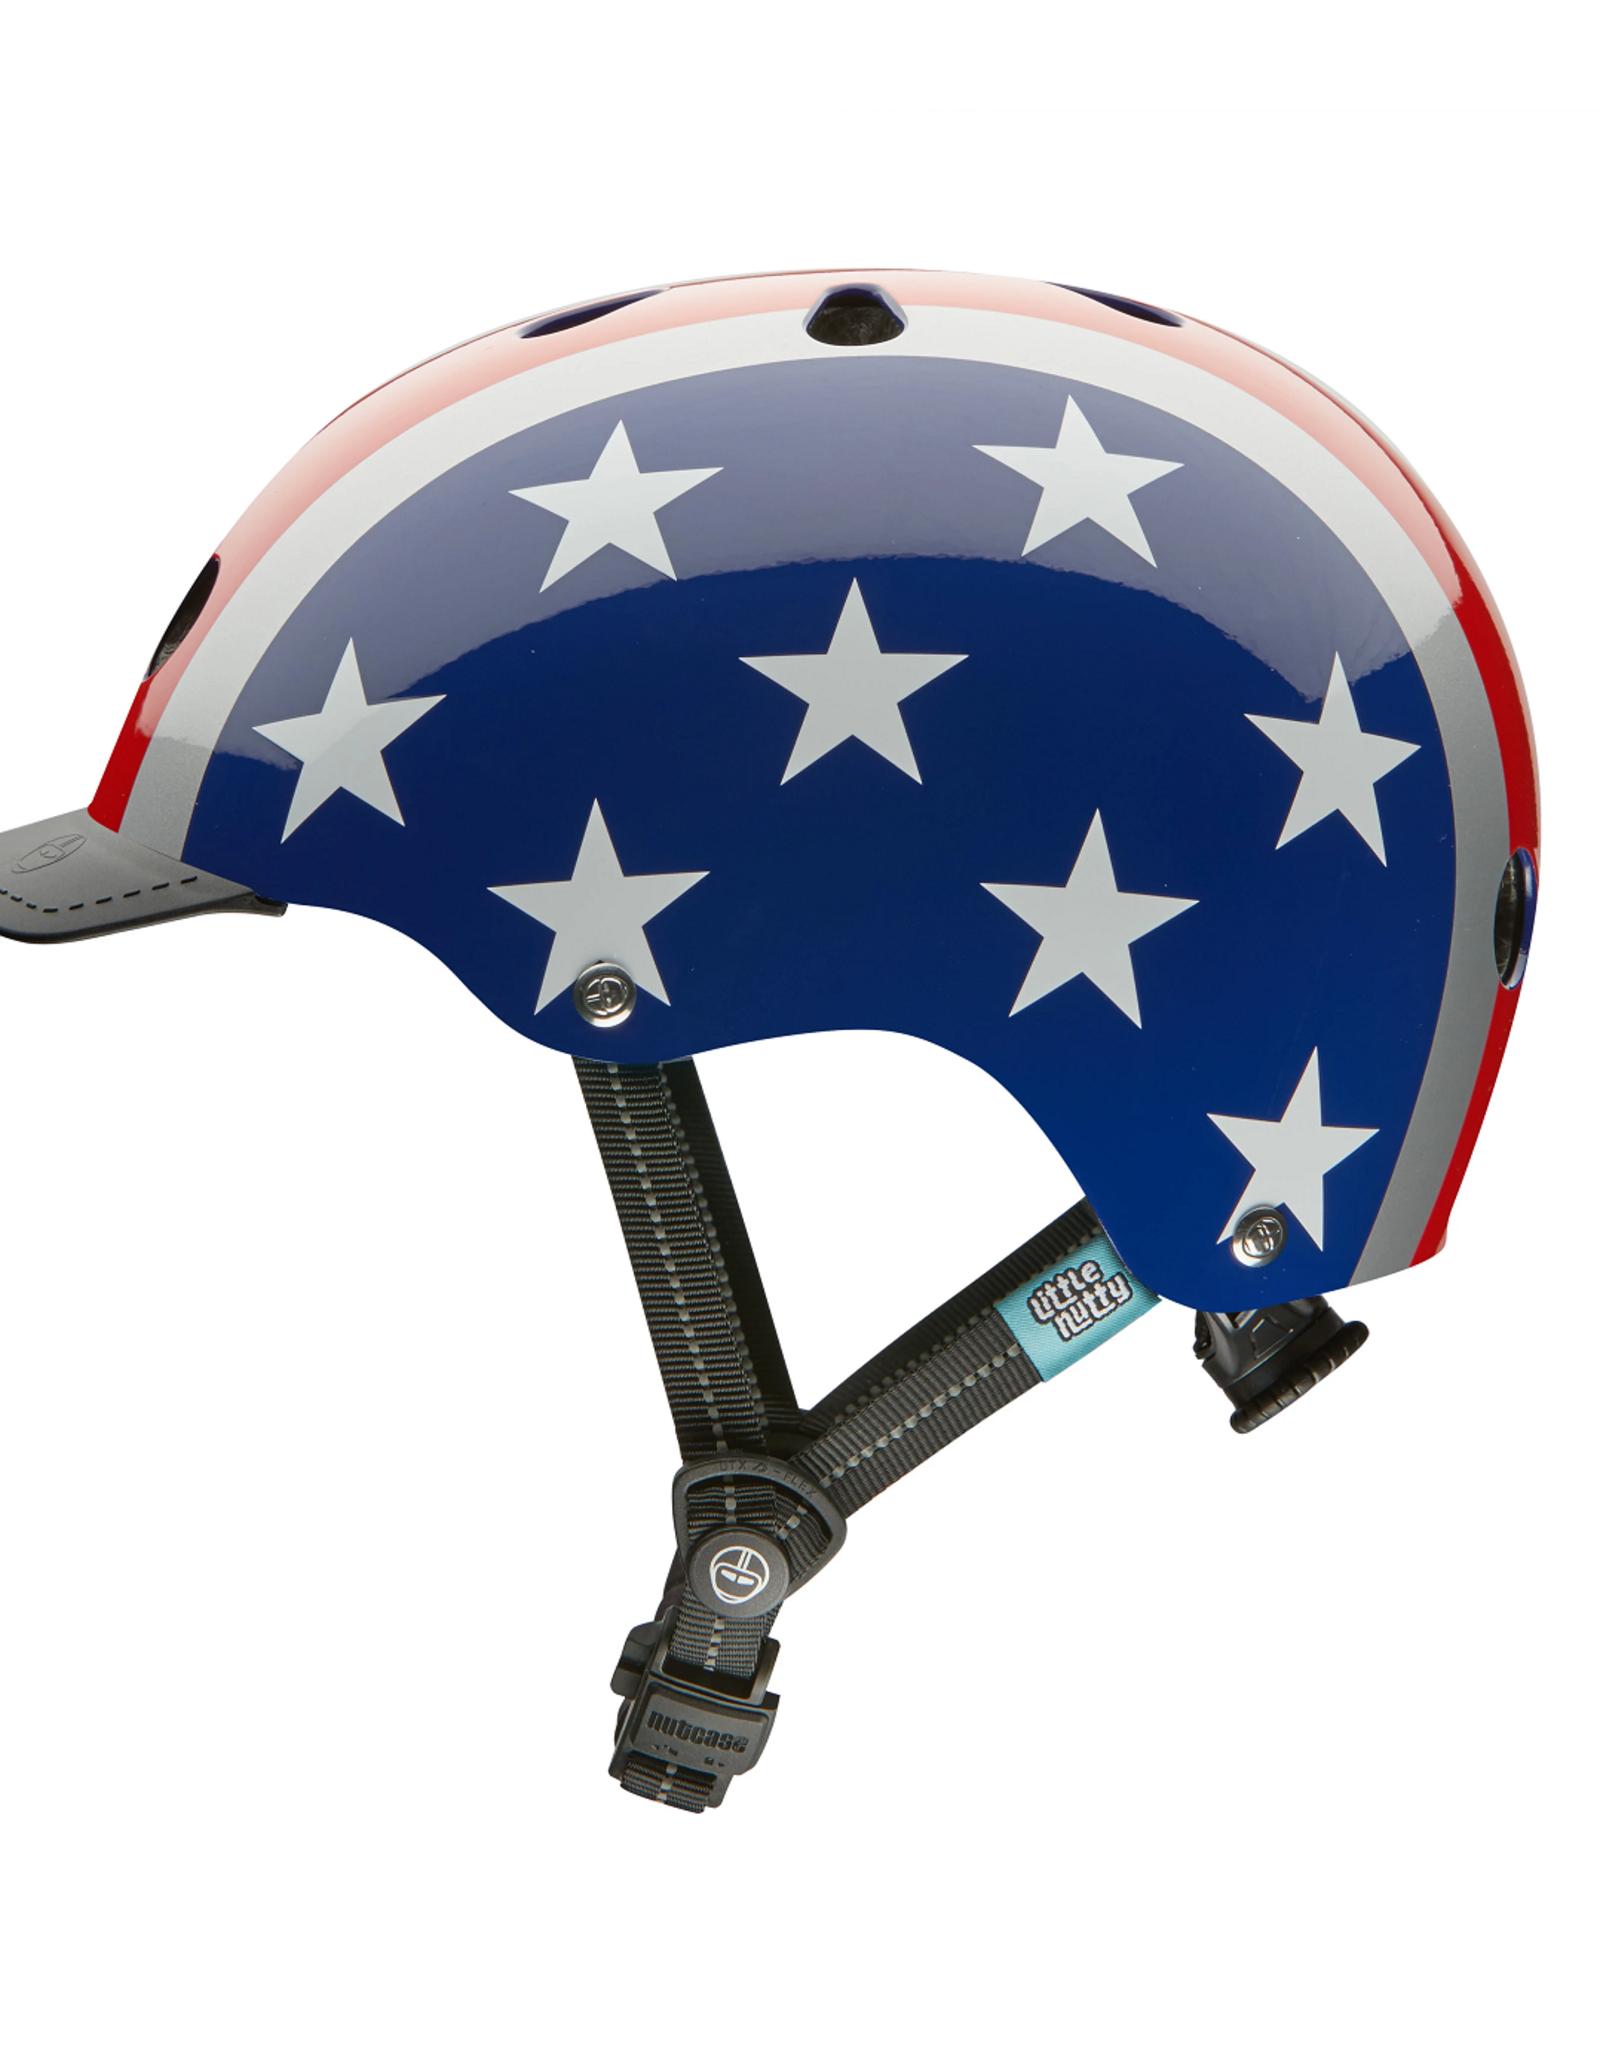 Nutcase Helmet - Nutcase Little Nutty Stars & Stripes